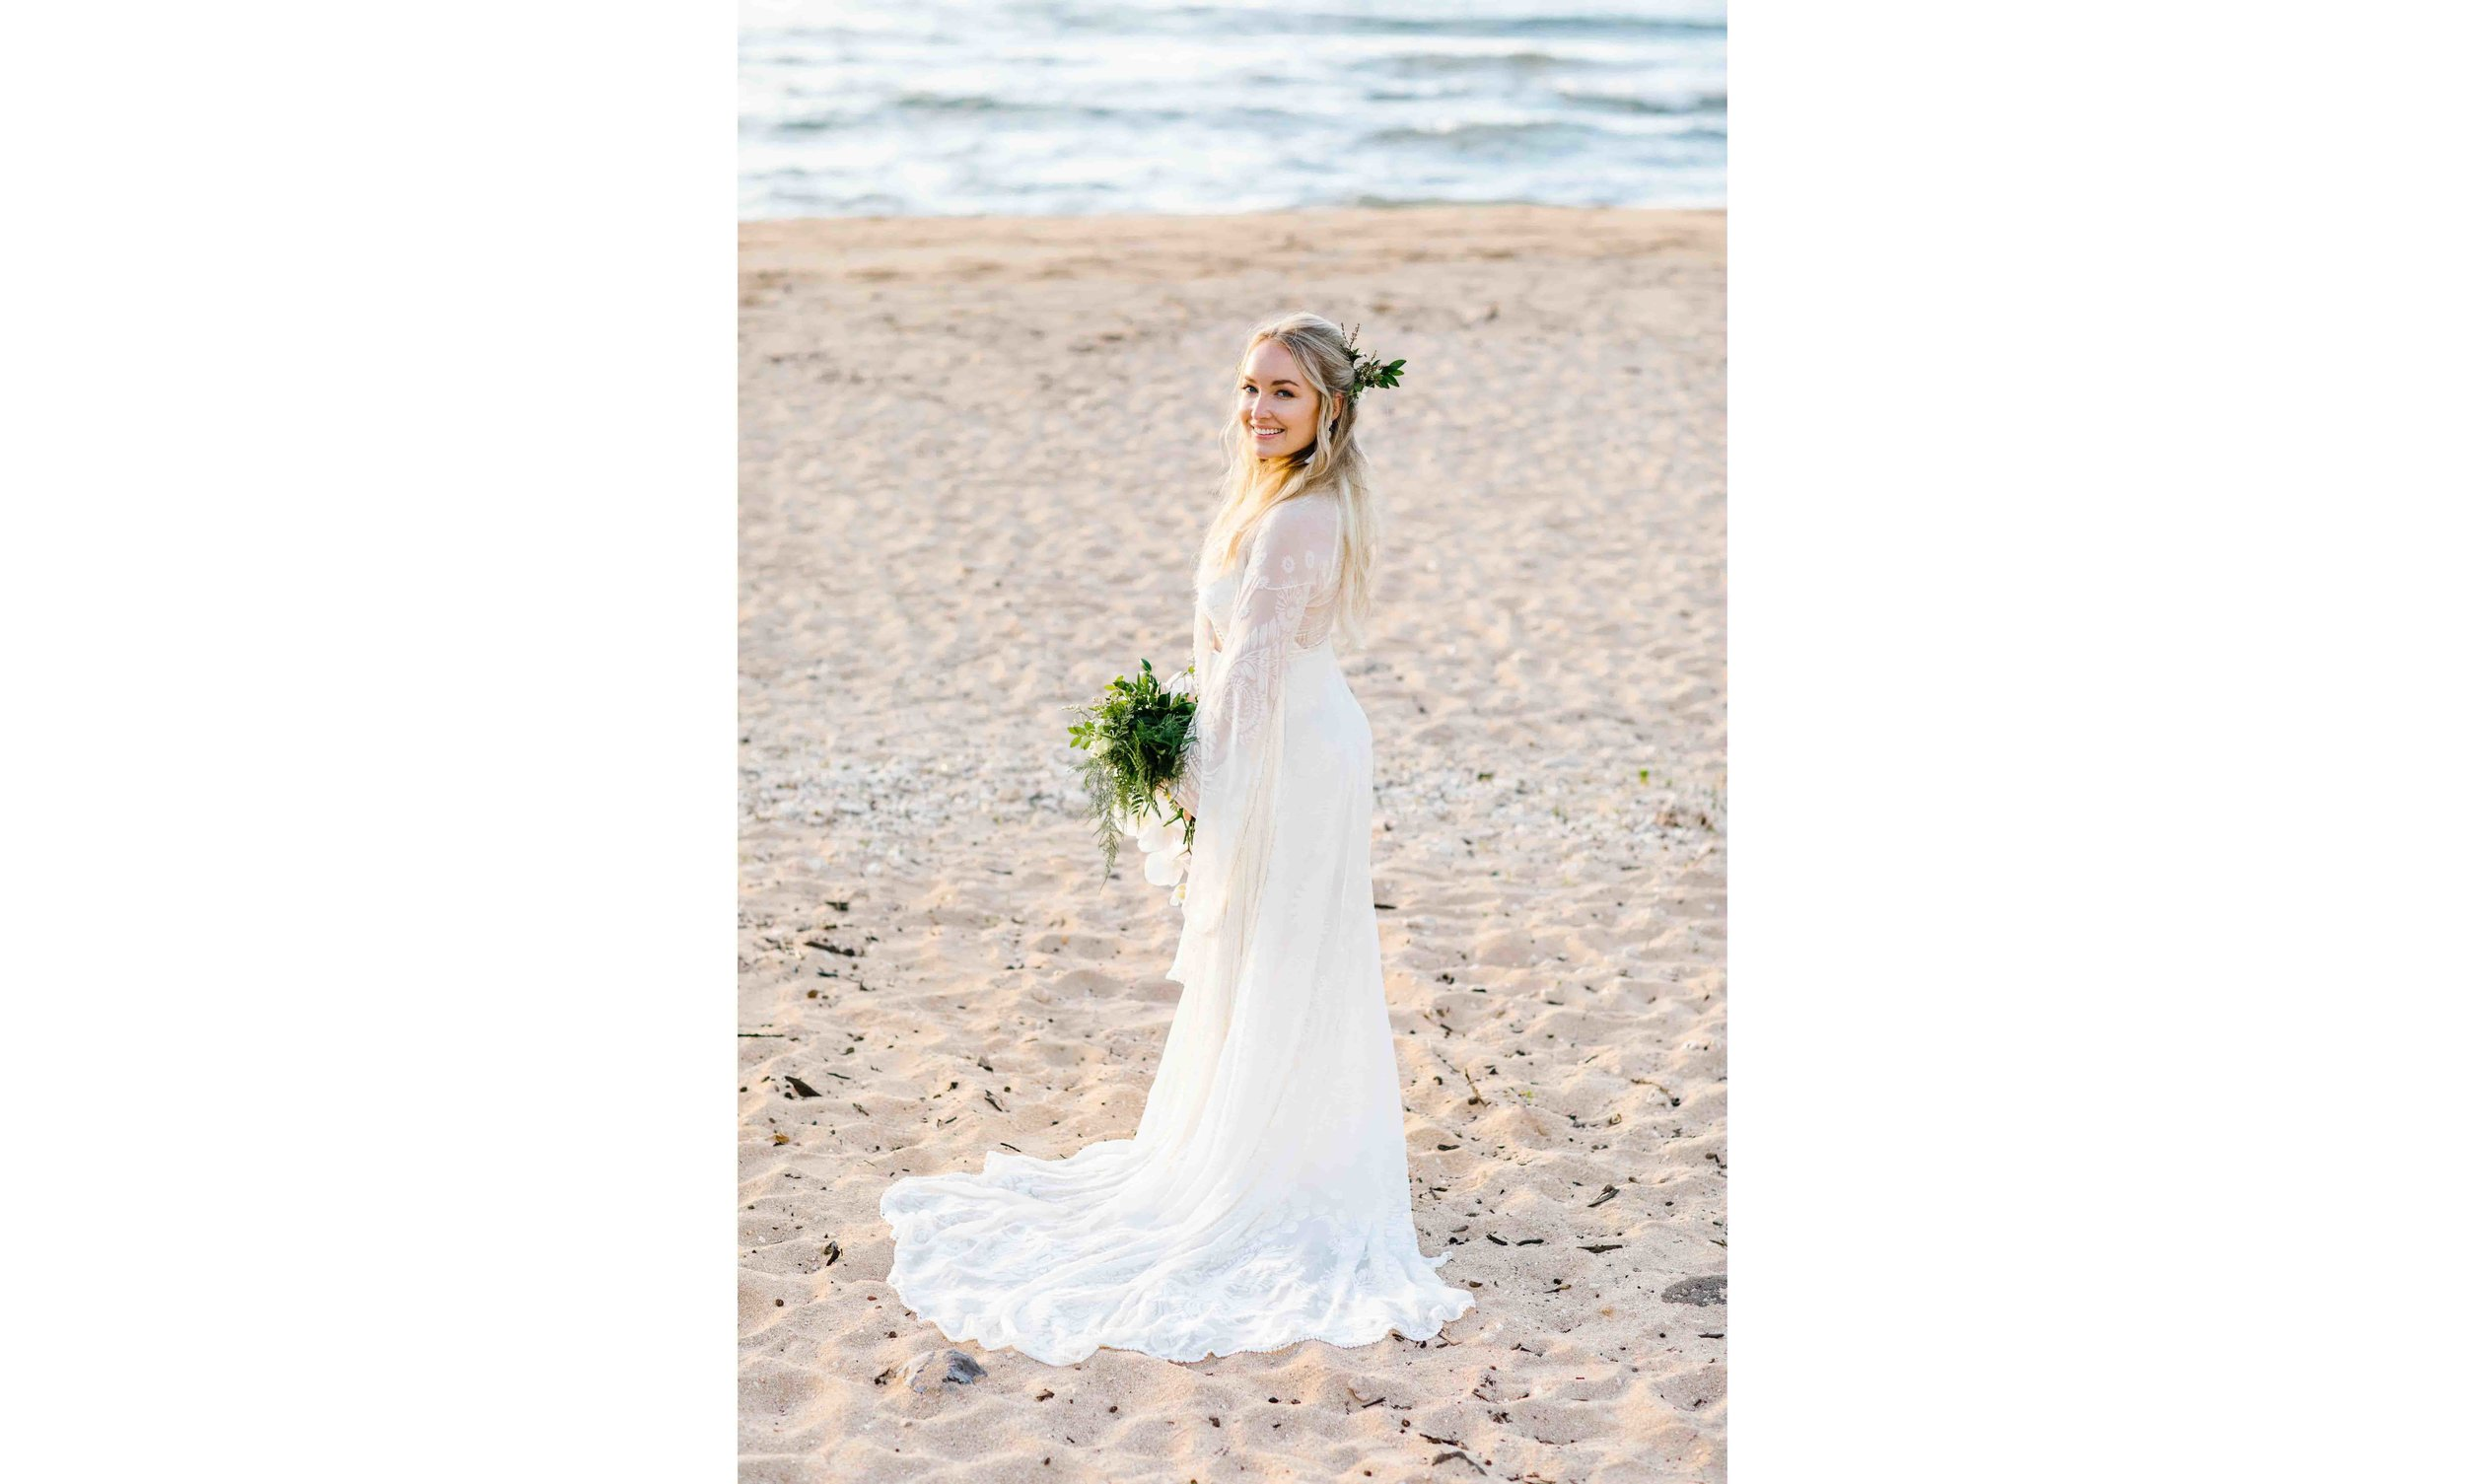 Boho Bride at a Hawaii Beach